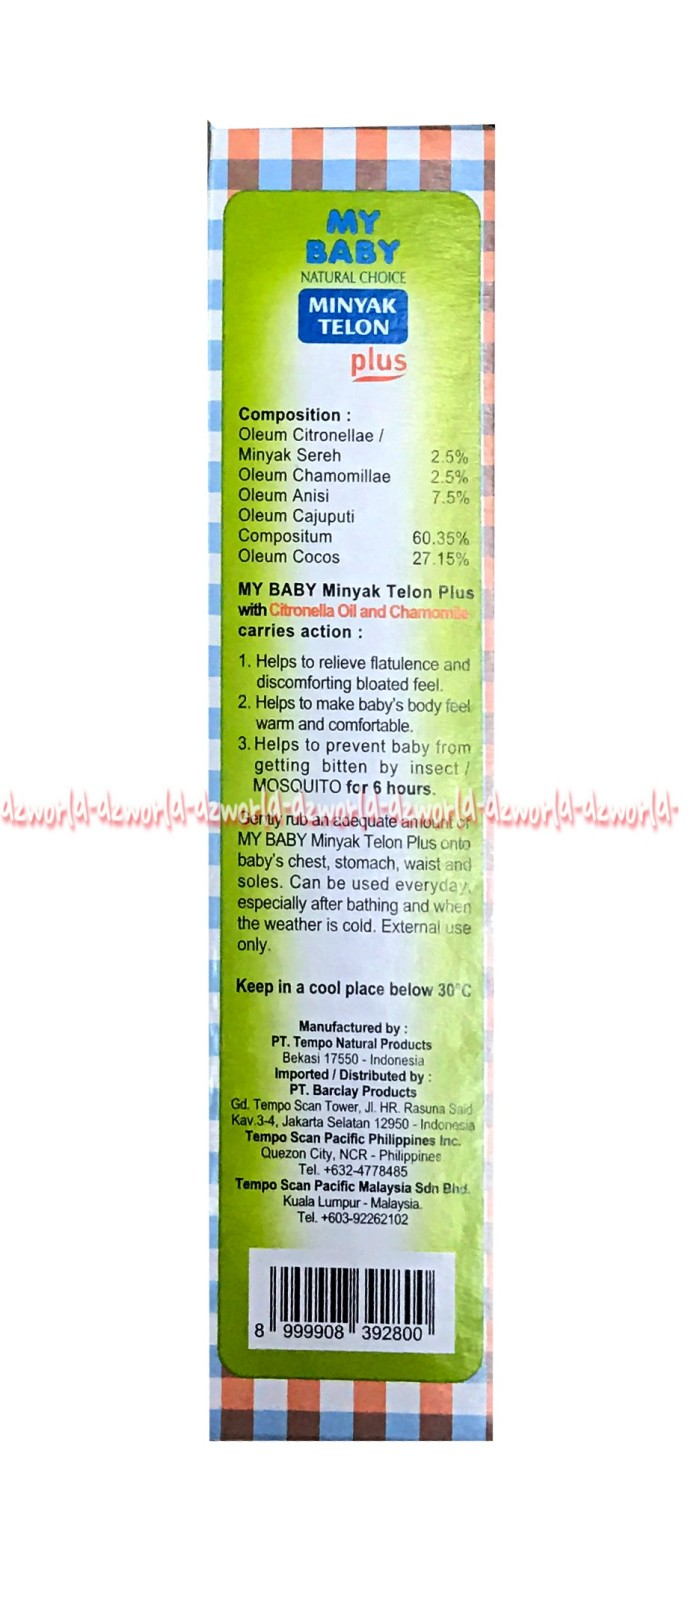 Free Tissue Basah My Baby Minyak Telon Plus Longer Protection 90 Ml 90ml Mtk033 Melindungi Anak Dari Gigitan Nyamuk 150ml